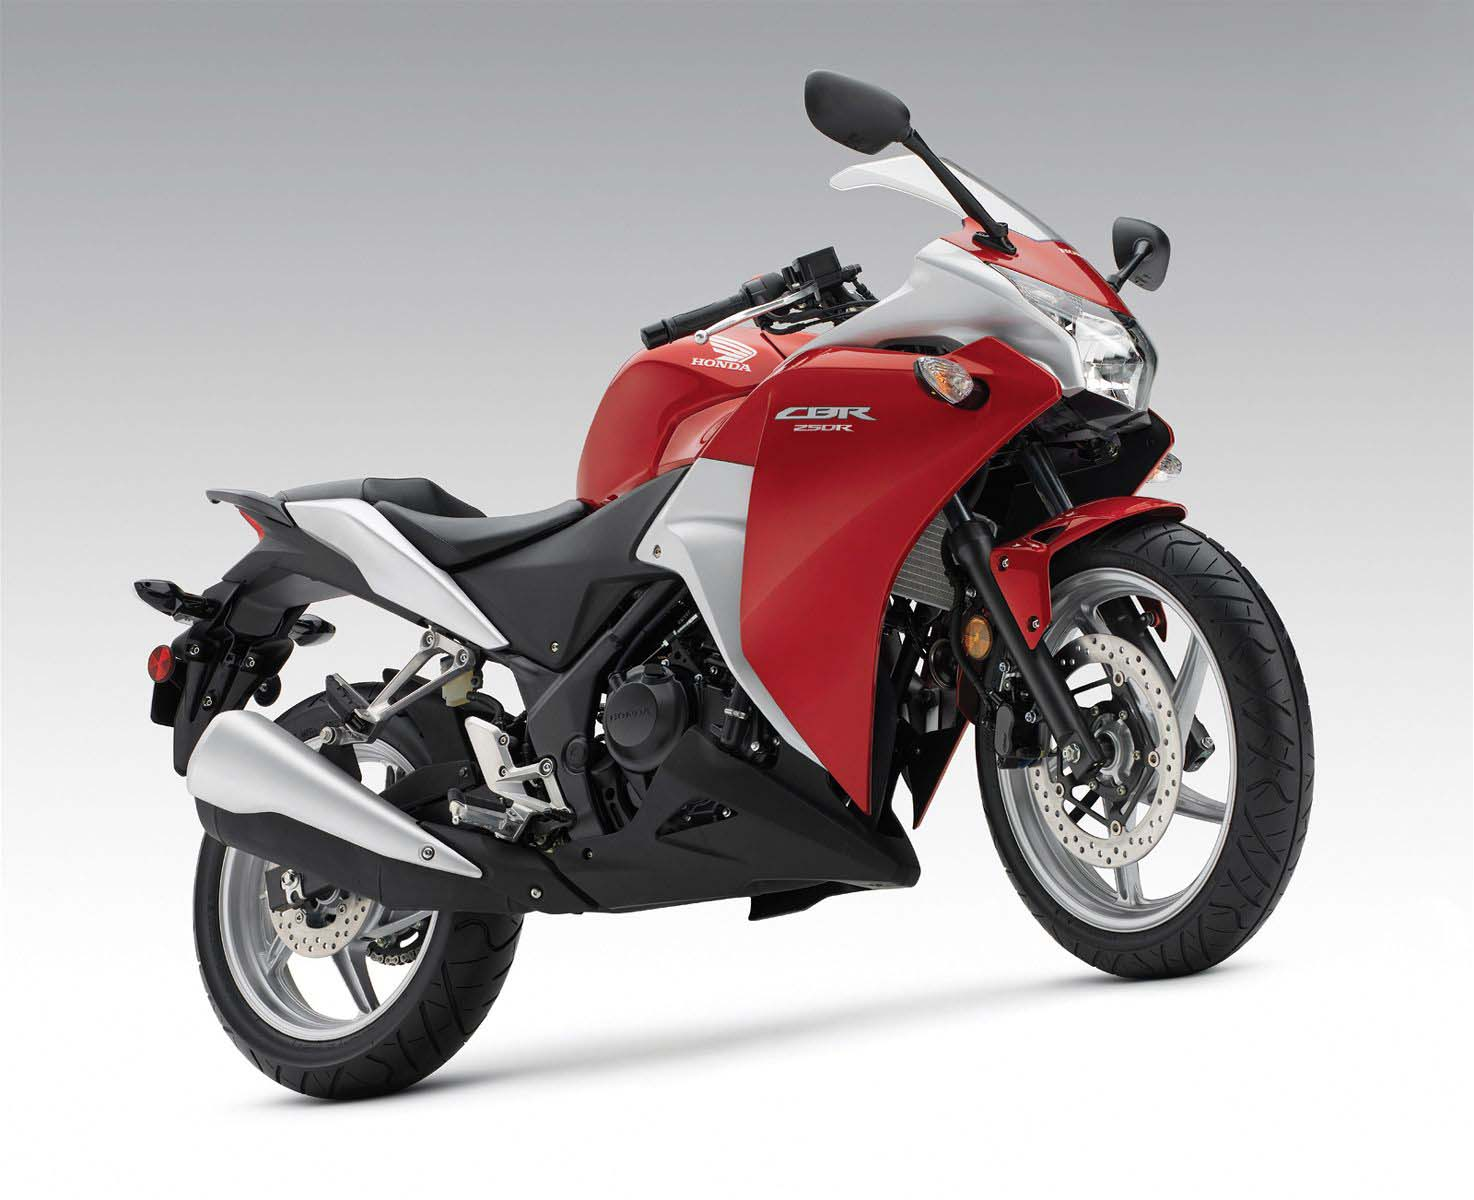 http://2.bp.blogspot.com/_qb8jpxJJgG0/TRLSUnl8CKI/AAAAAAAAEPE/5Keyf903uV4/s1600/2011-Honda-CBR250R-1.jpg